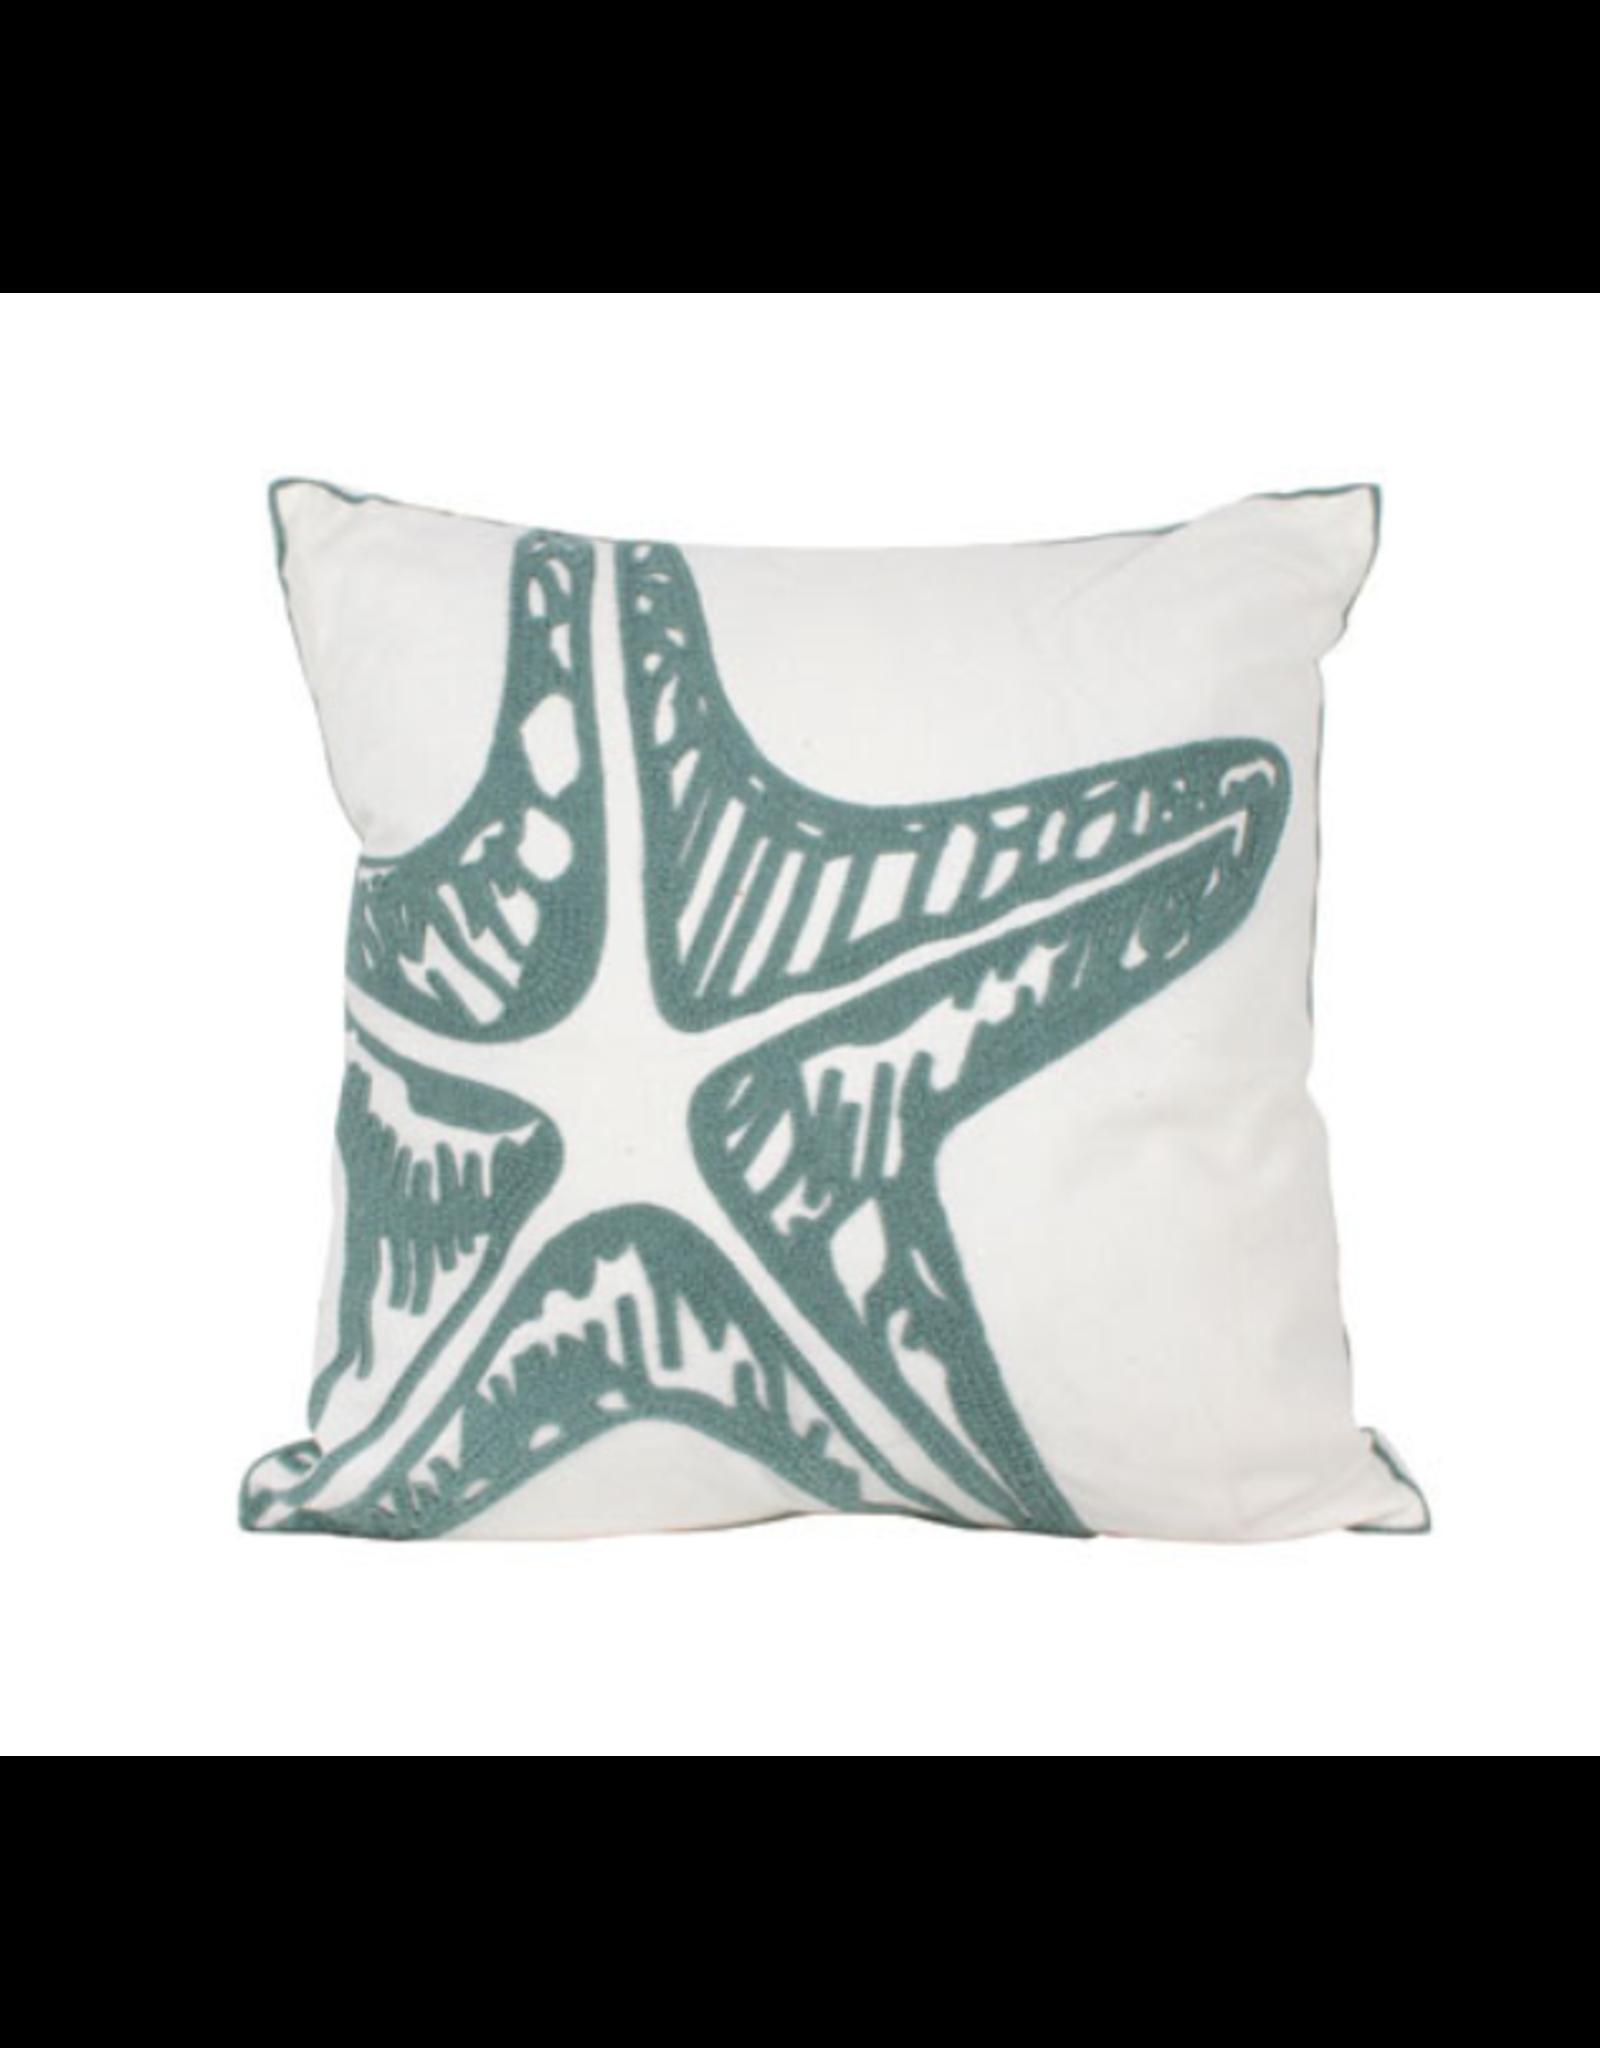 Stelli Star Fish Embroided Cushion